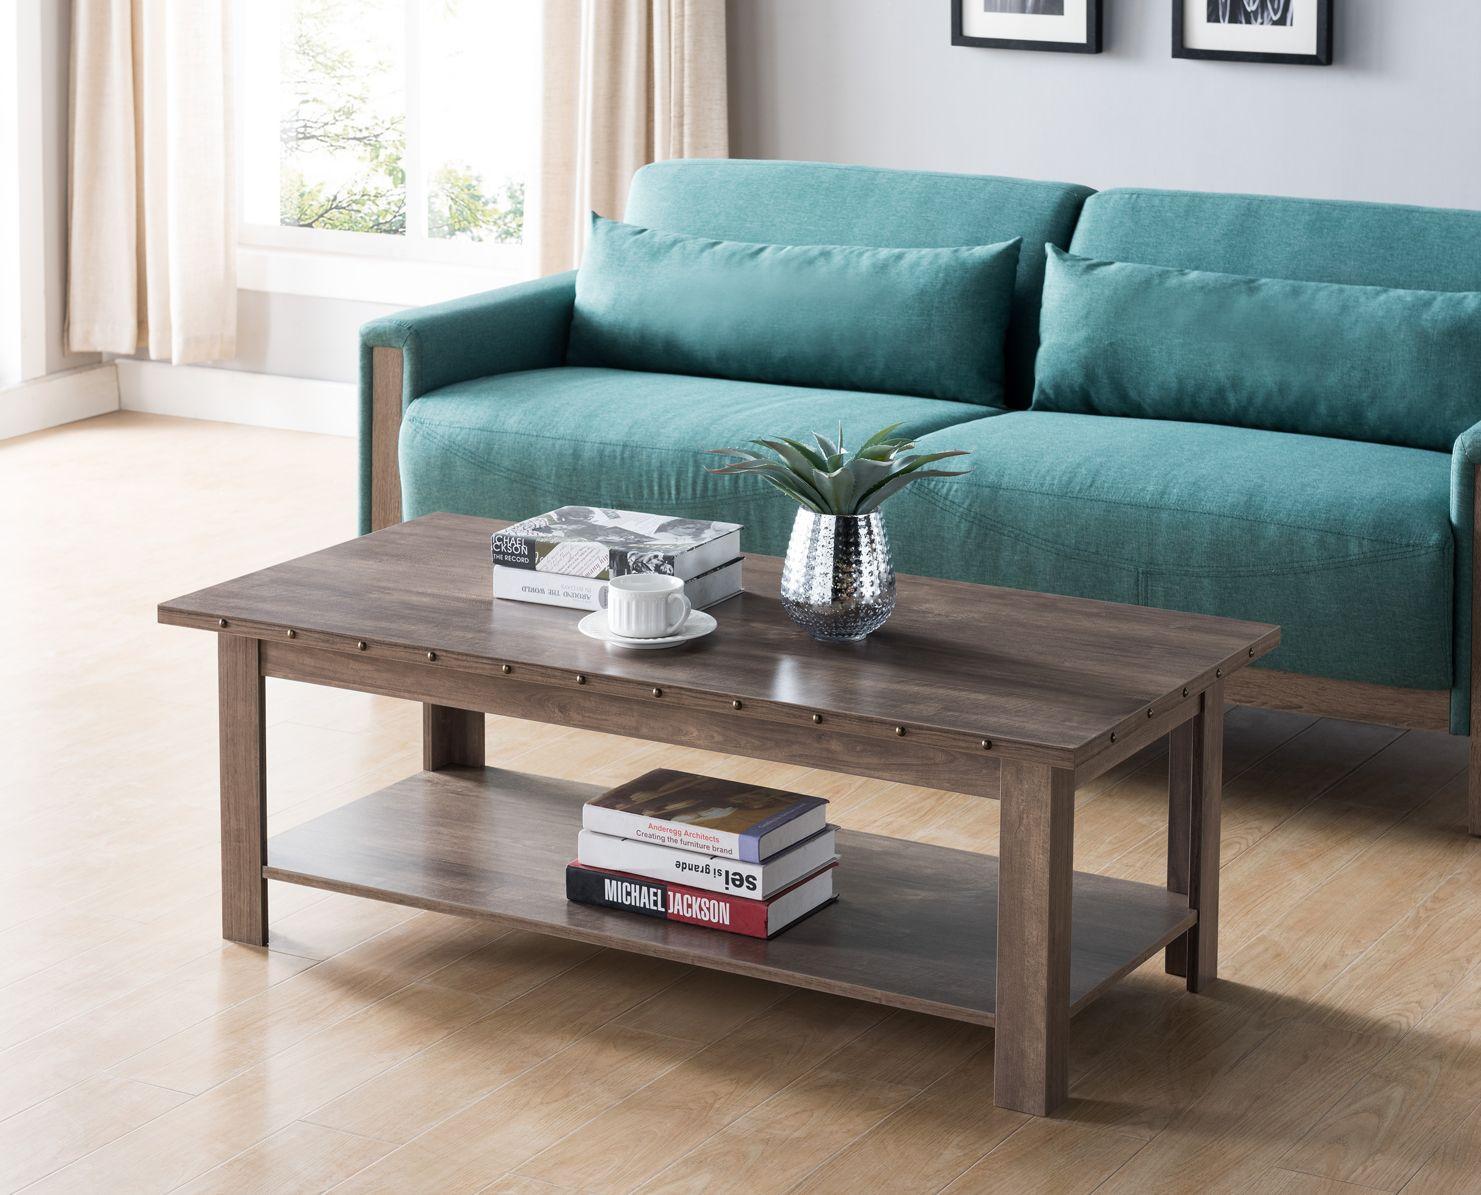 Id Usa 182286ct Coffee Table With Stud Details Idusa Idusafurniture Mid Century Modern Coffee Table Coffee Table Living Room Leather [ 1195 x 1481 Pixel ]